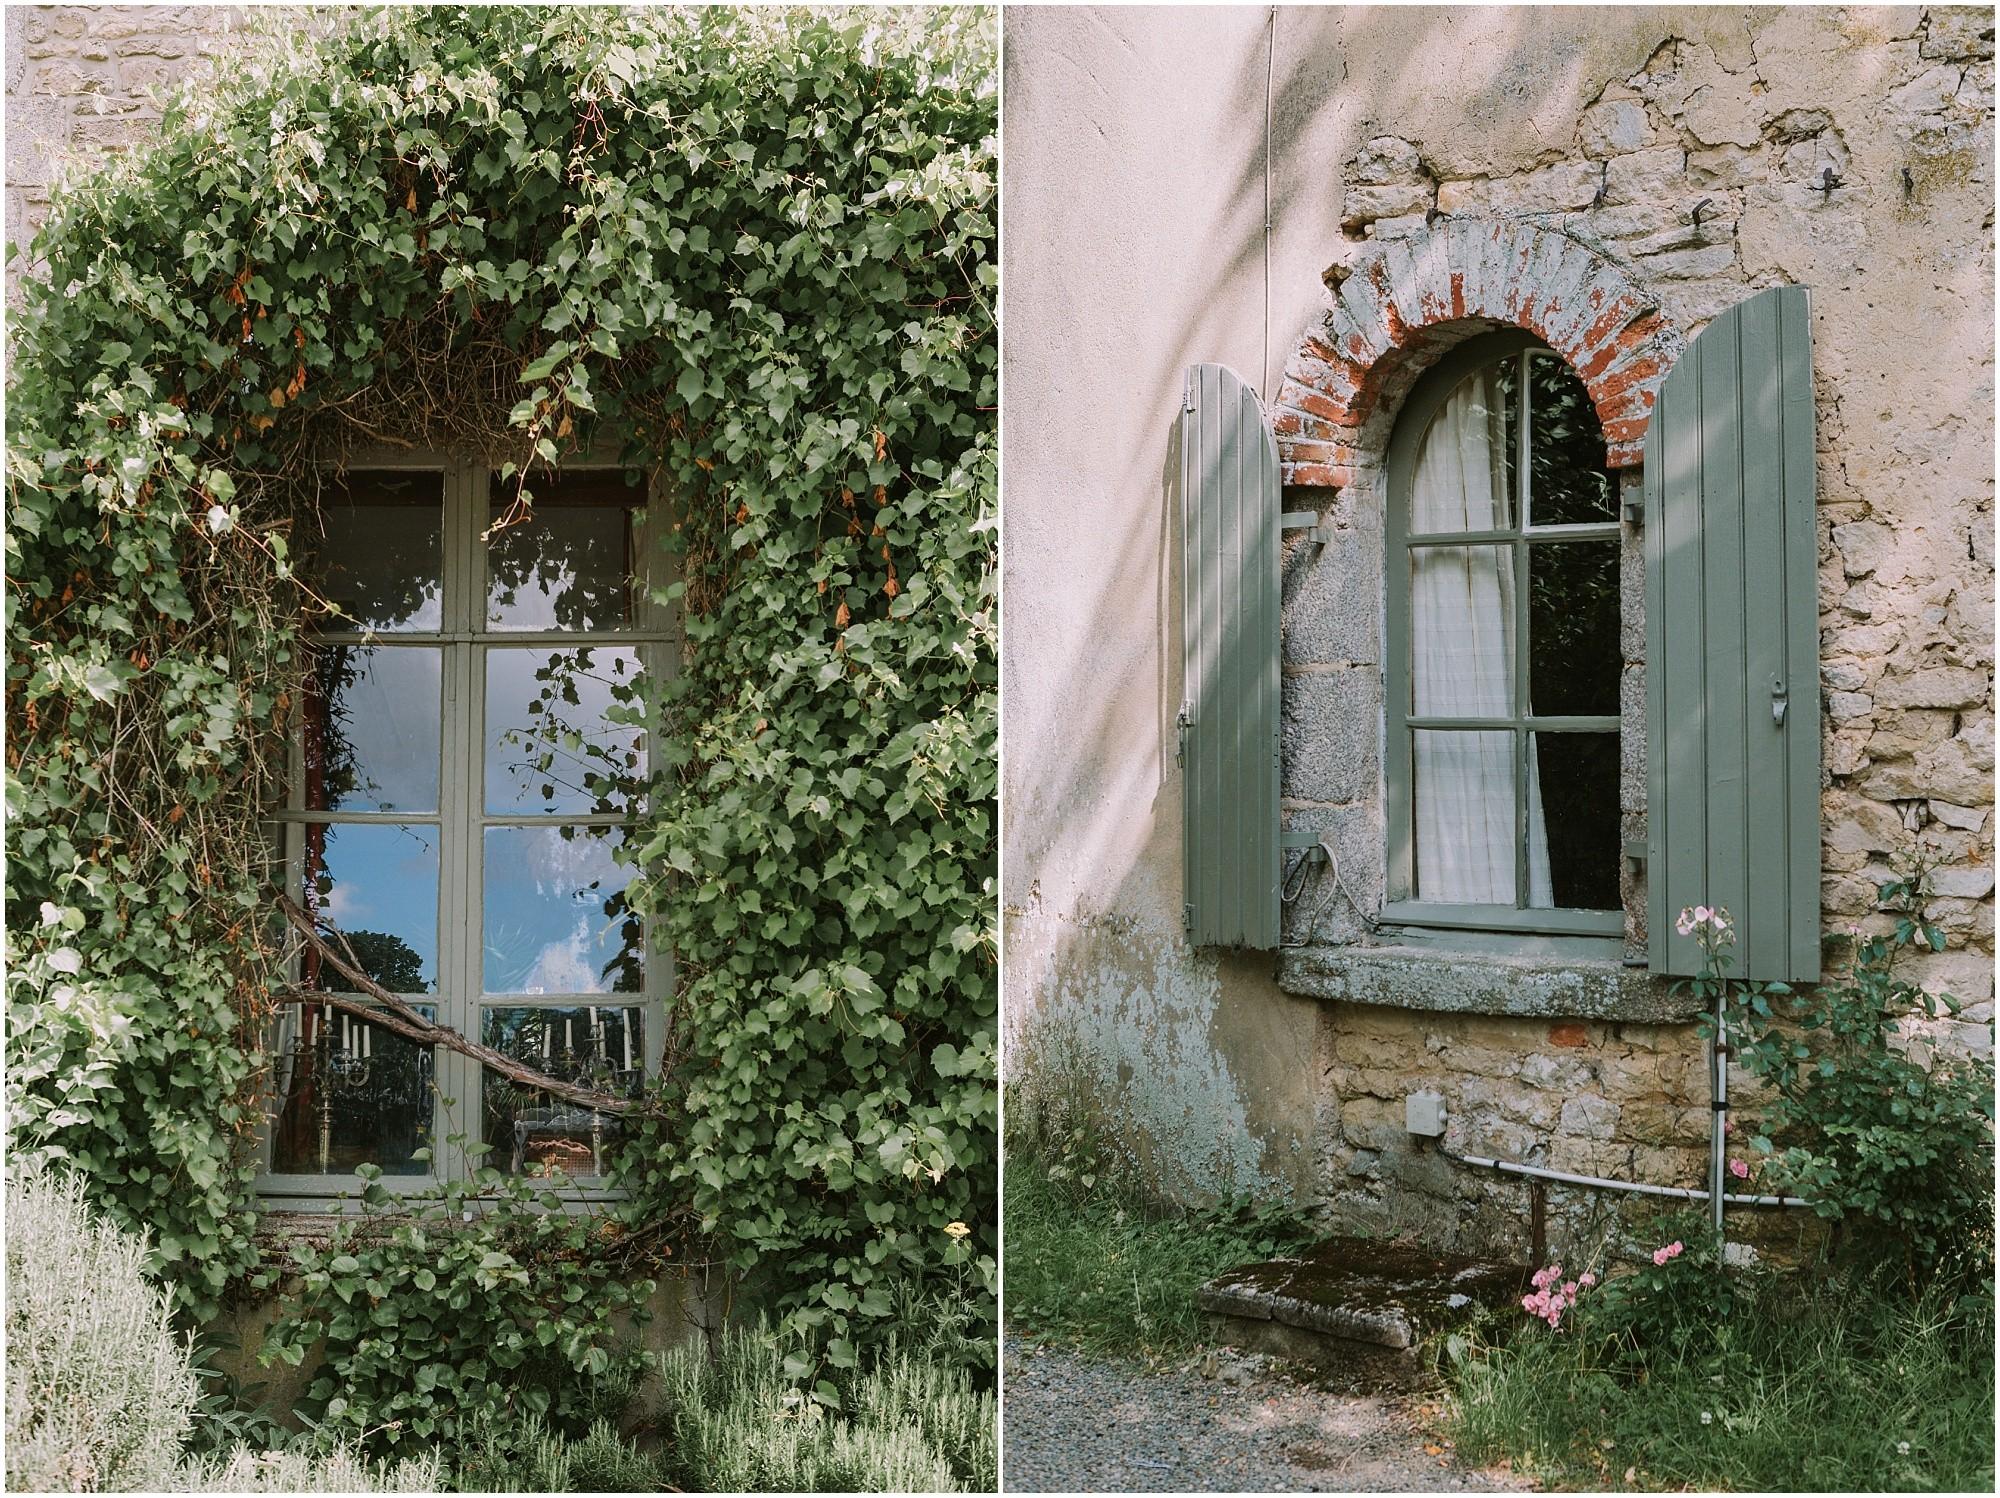 Kateryna-photos-photographer-mariage-chateau-saint-paterne-alencon-normandie-mayenne-le-mans_0002.jpg